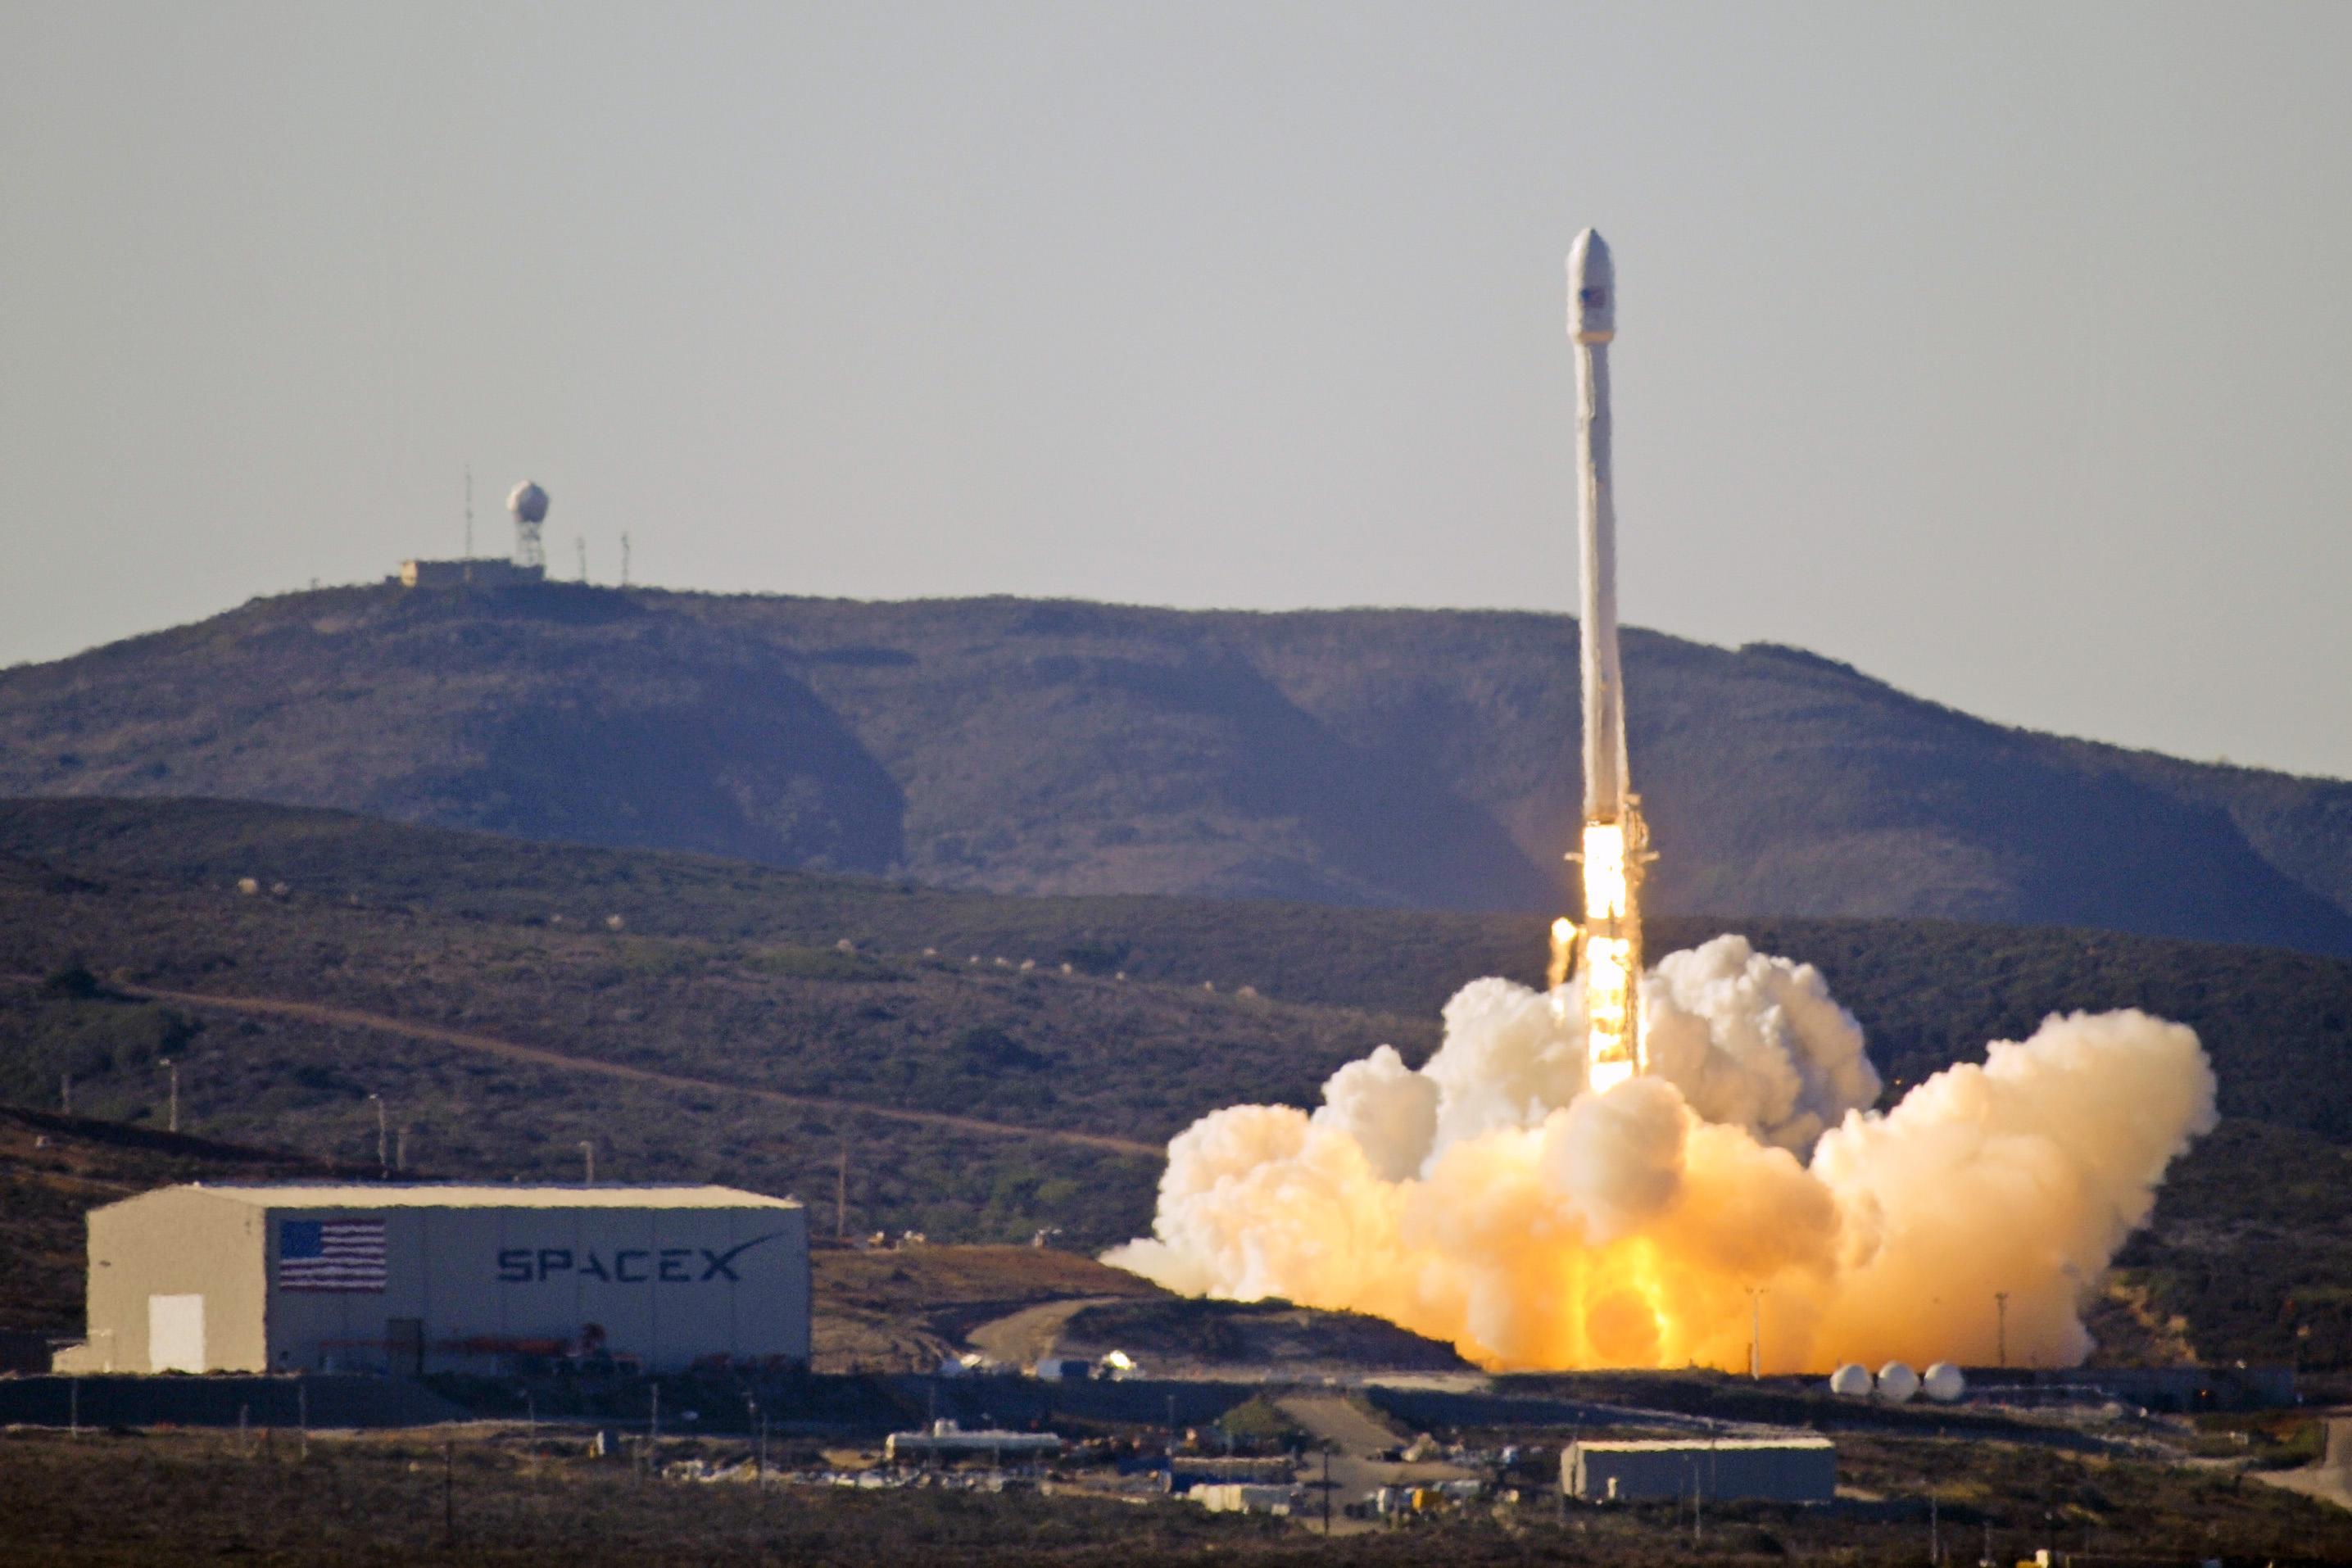 SpaceX公司猎鹰9号火箭首次为军方发射间谍卫星